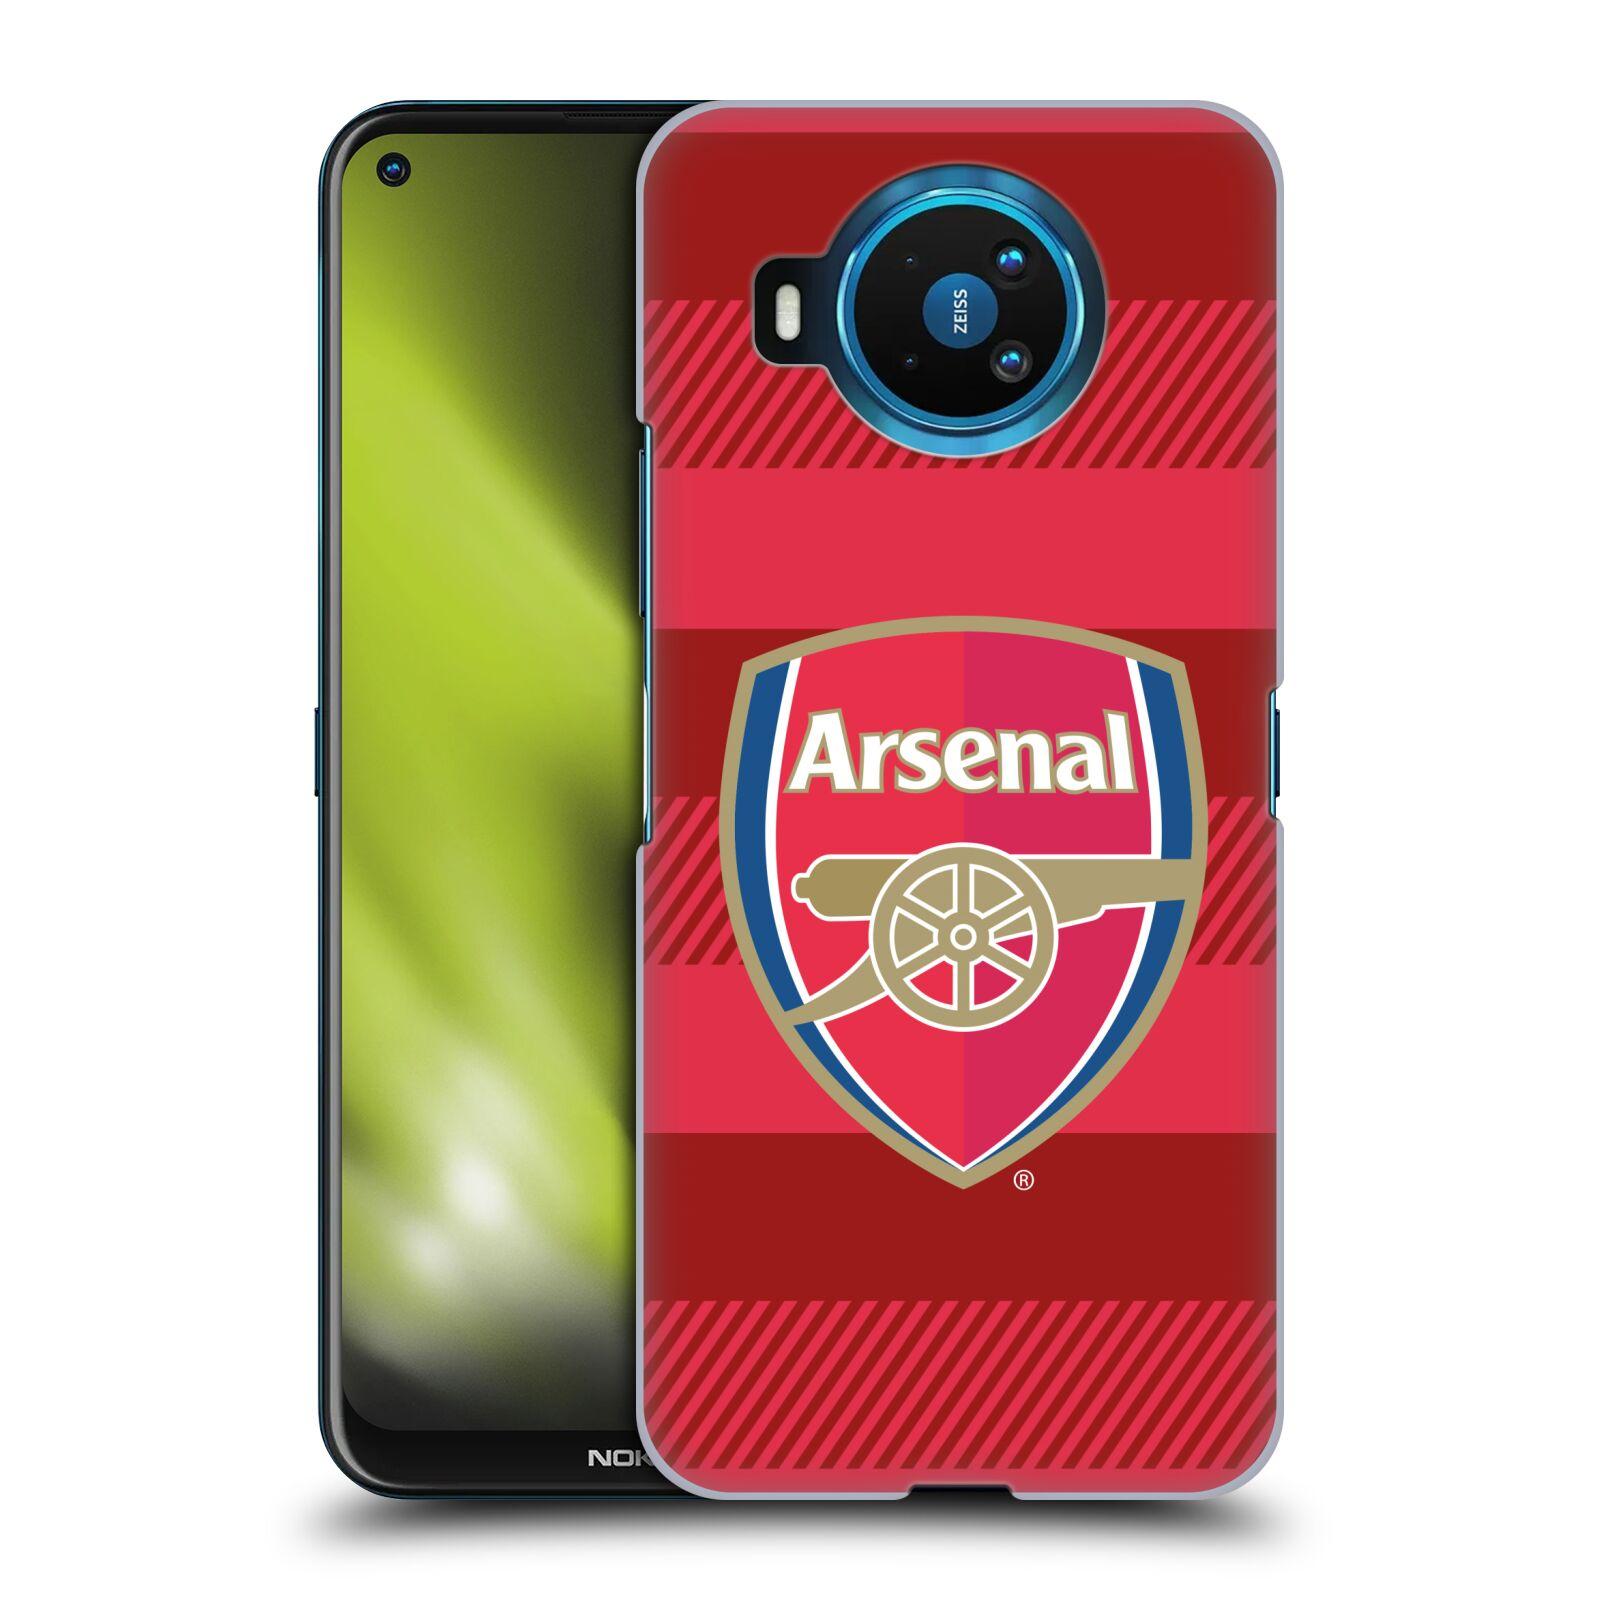 Plastové pouzdro na mobil Nokia 8.3 5G - Head Case - Arsenal FC - Logo s pruhy